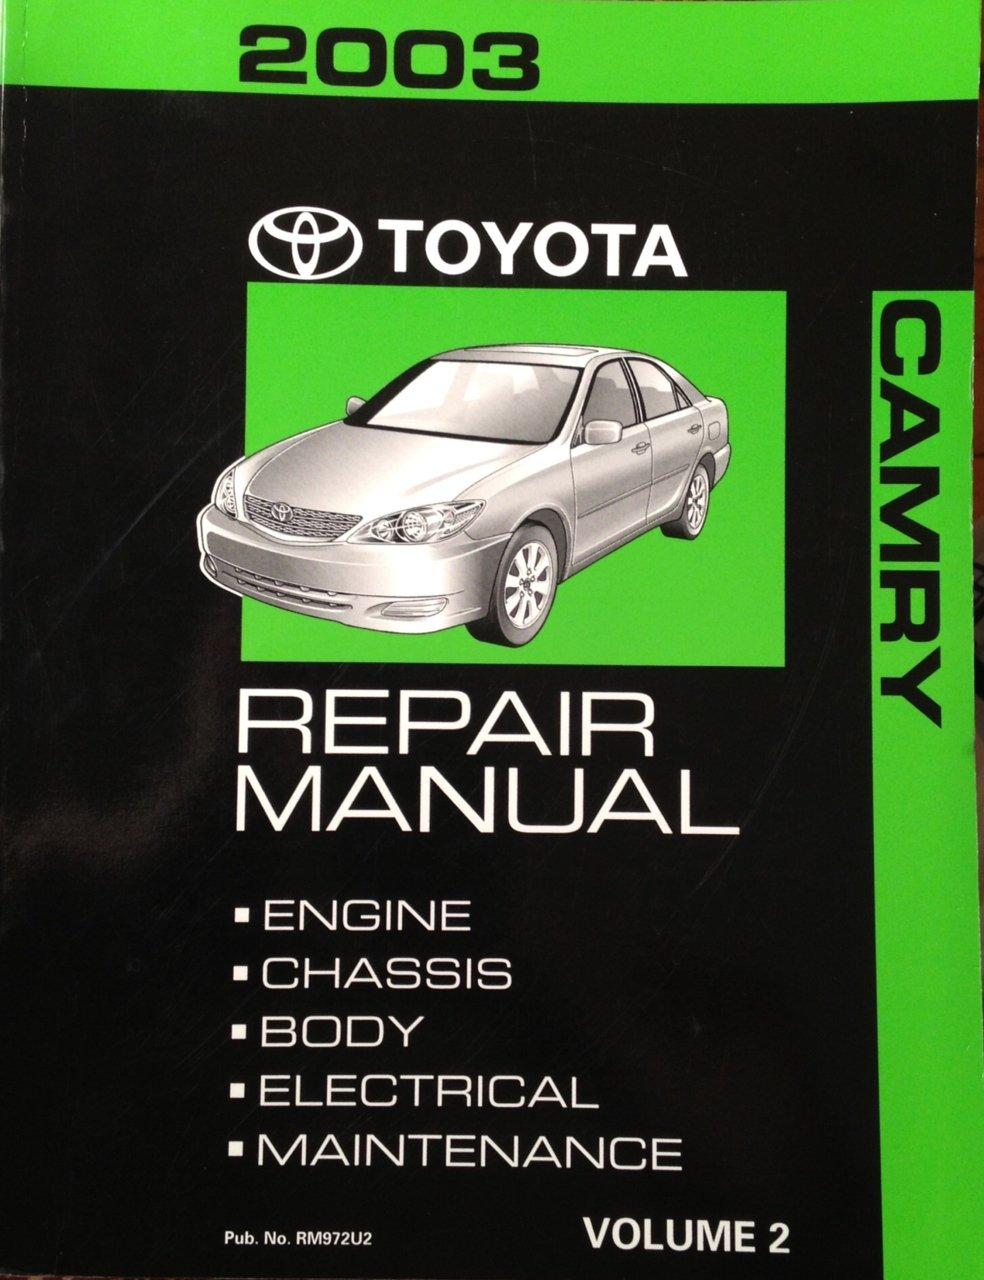 2003 toyota camry maintenance manual